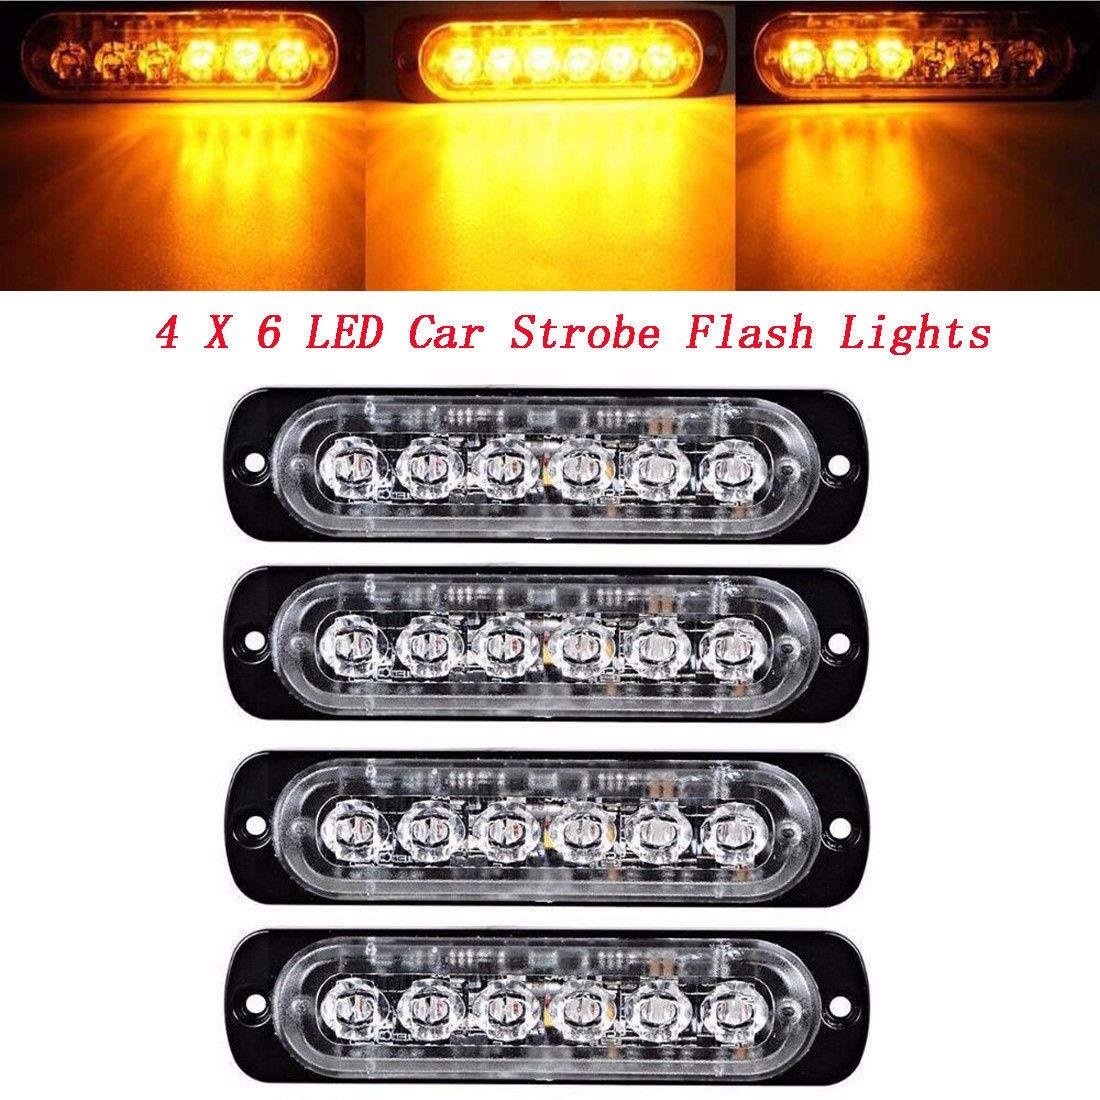 MASO Car Emergency Warning Light Amber Flashing Hazard Beacon for Trucks 4 LED Recovery Strobe Warning Flashing Light Car Lamp 12V//24V White 2 Pcs